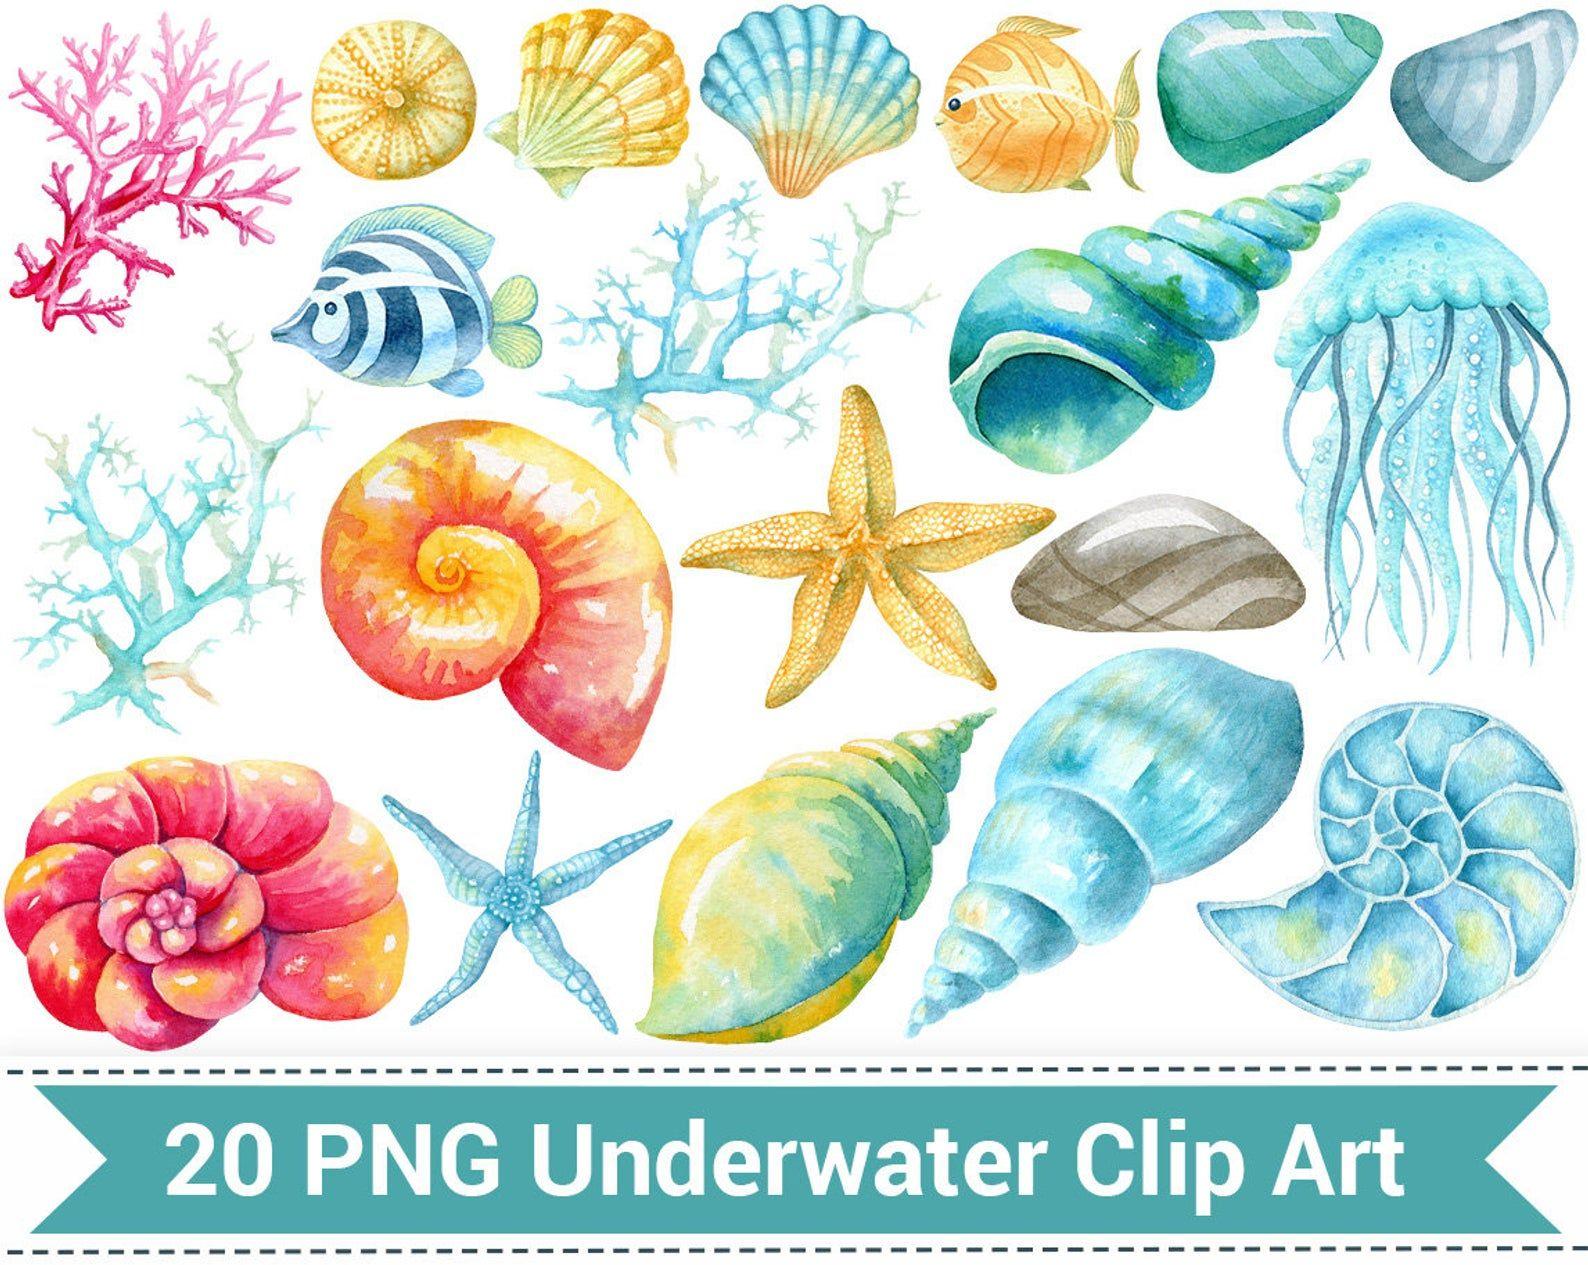 Shell clipart sea life. Nautical watercolor underwater clip